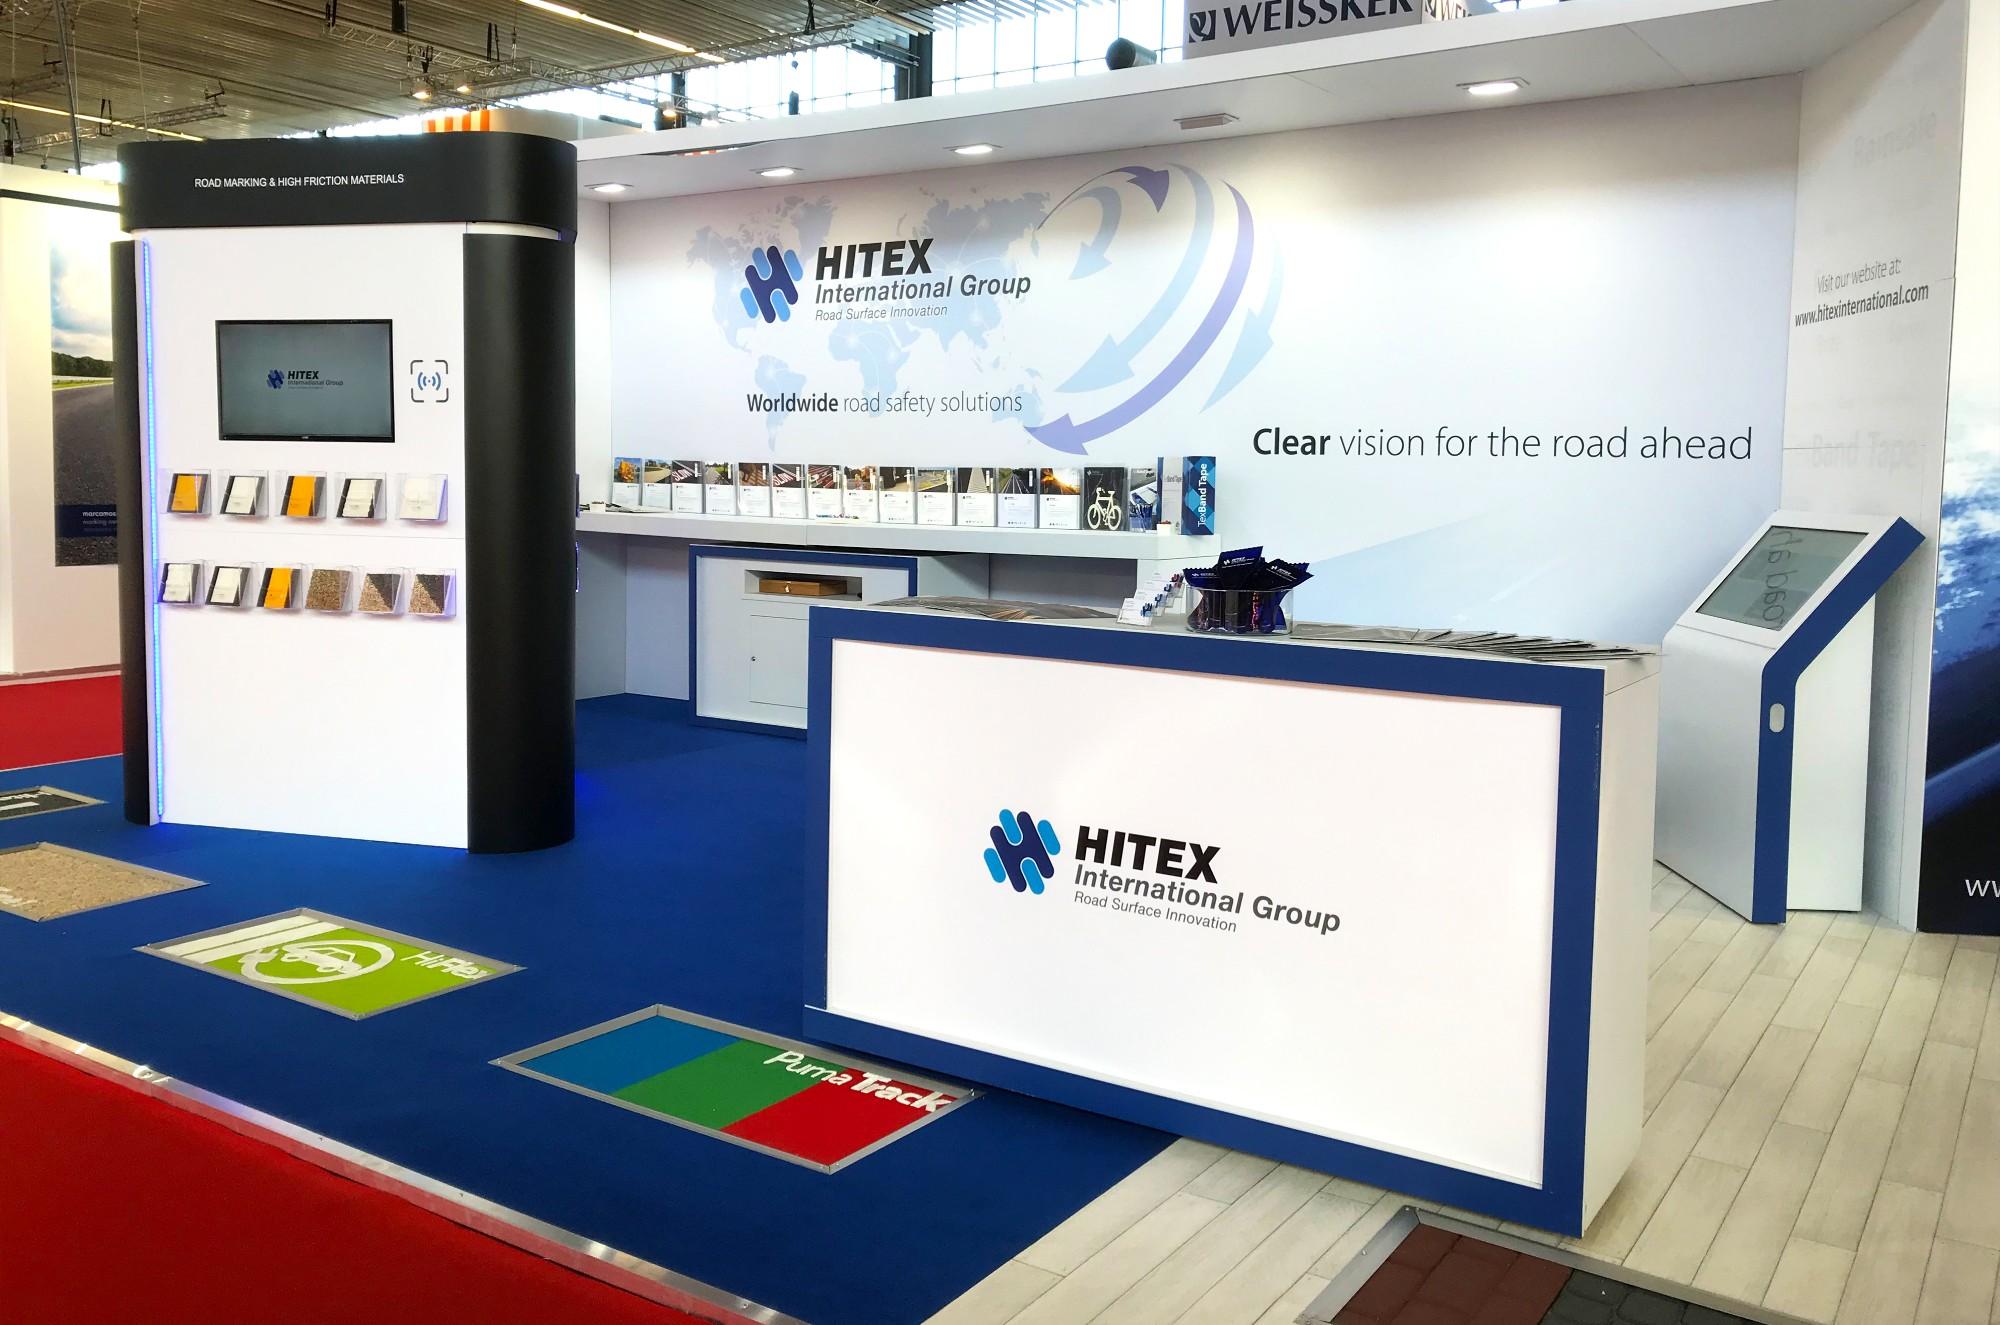 Hitex at Intertraffic 2018 5